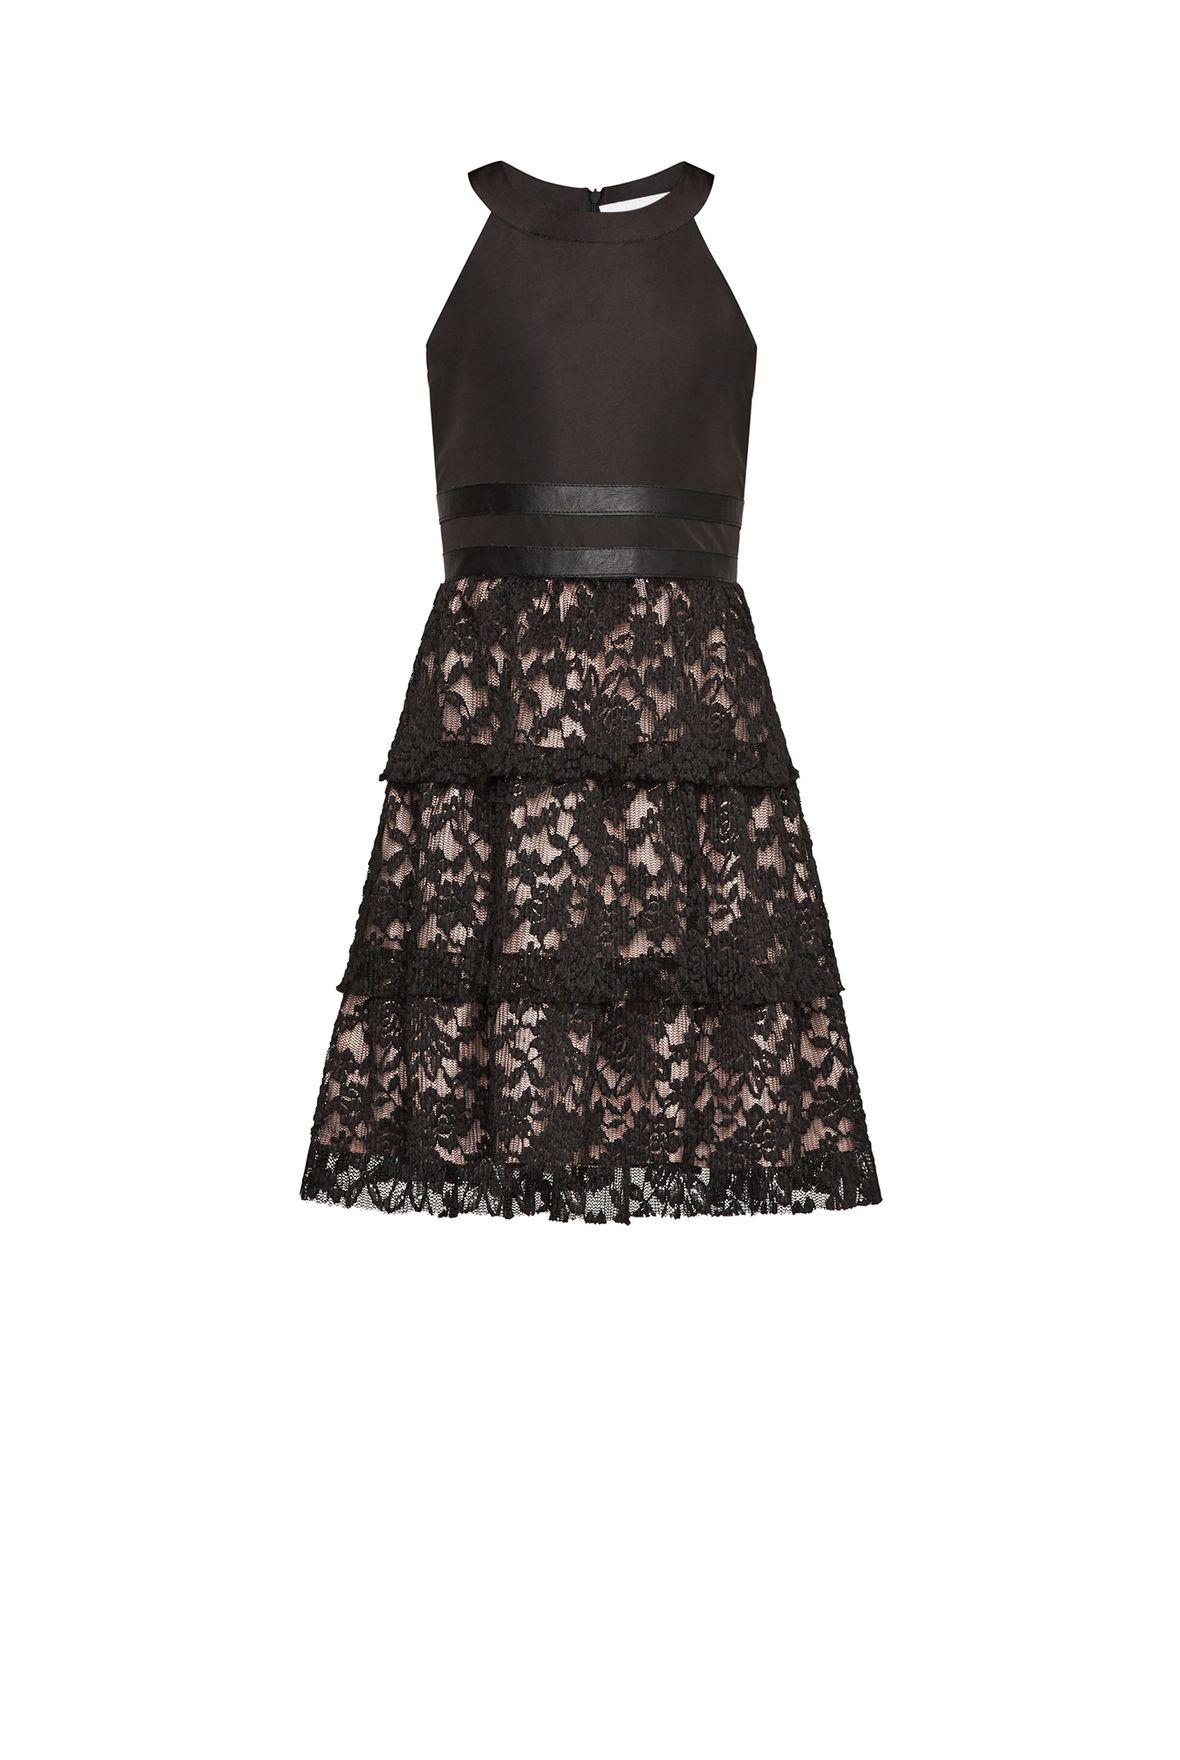 Vestido-BCBGirls-negro-con-encaje-B838DR184_BLK_e